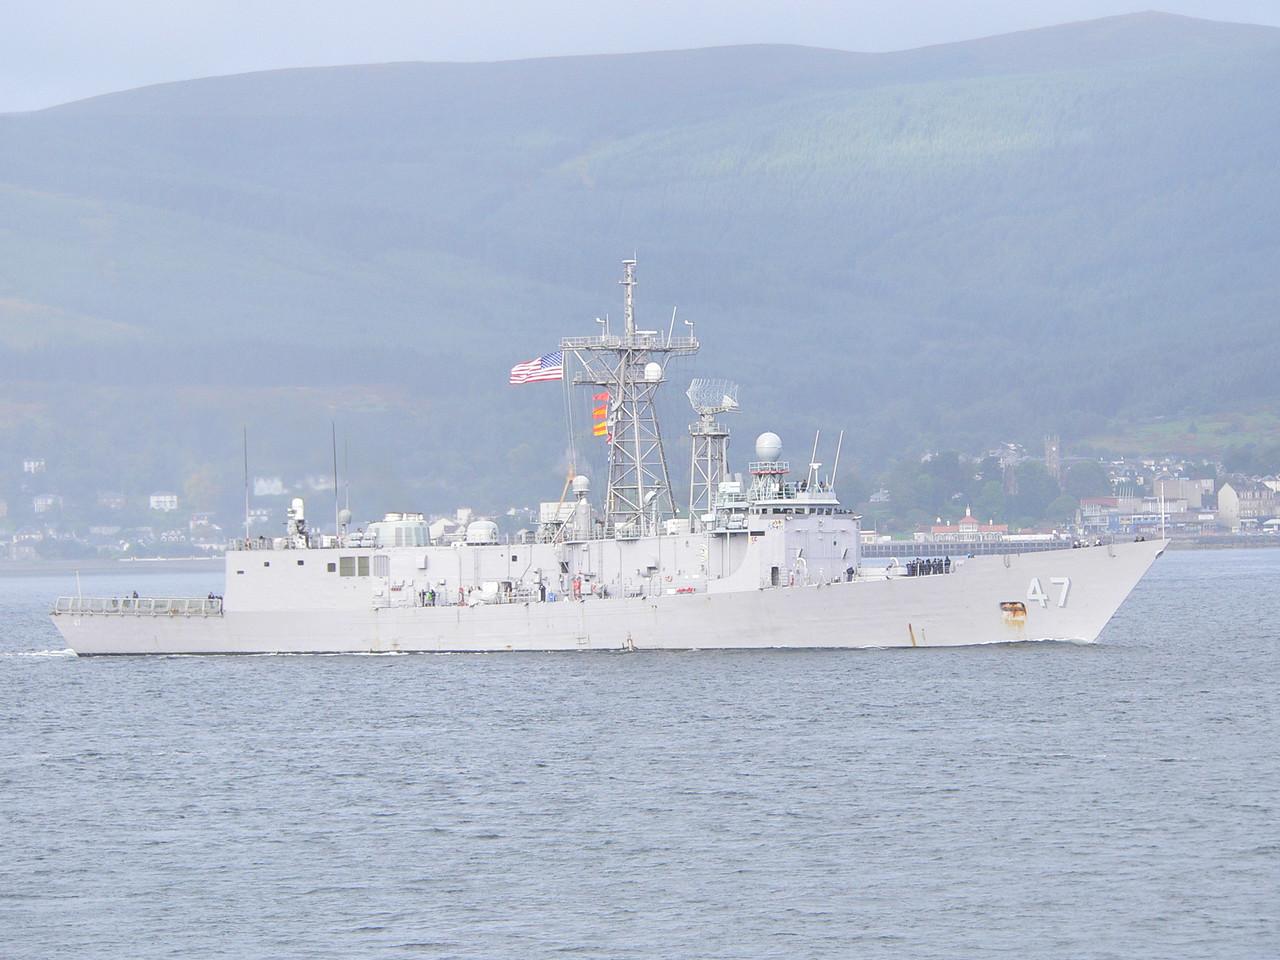 FFG-47 USS NICHOLAS